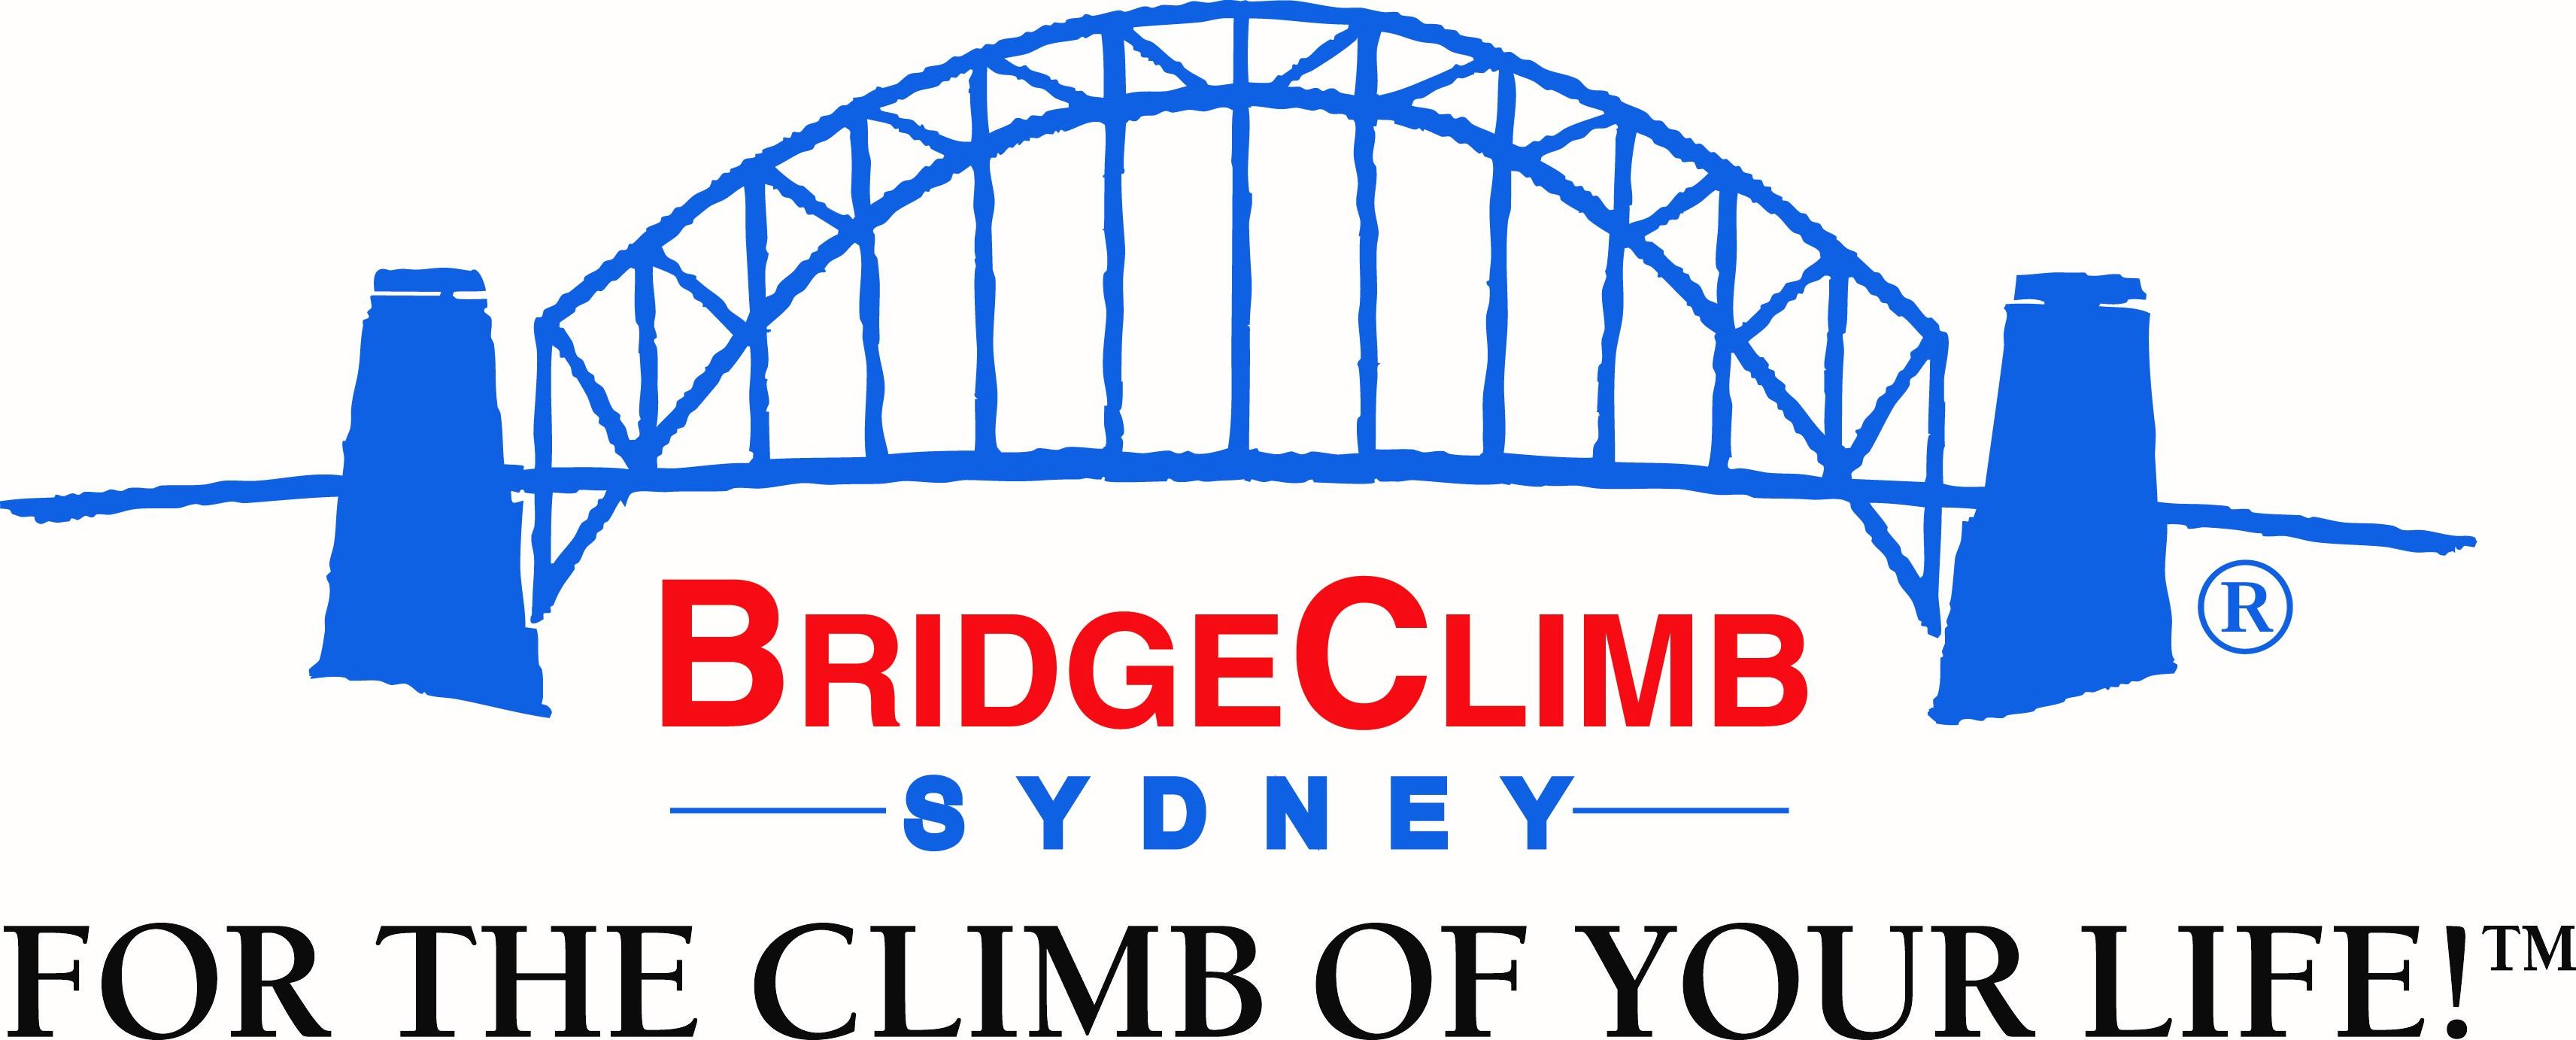 Bridge Climb Sydney image